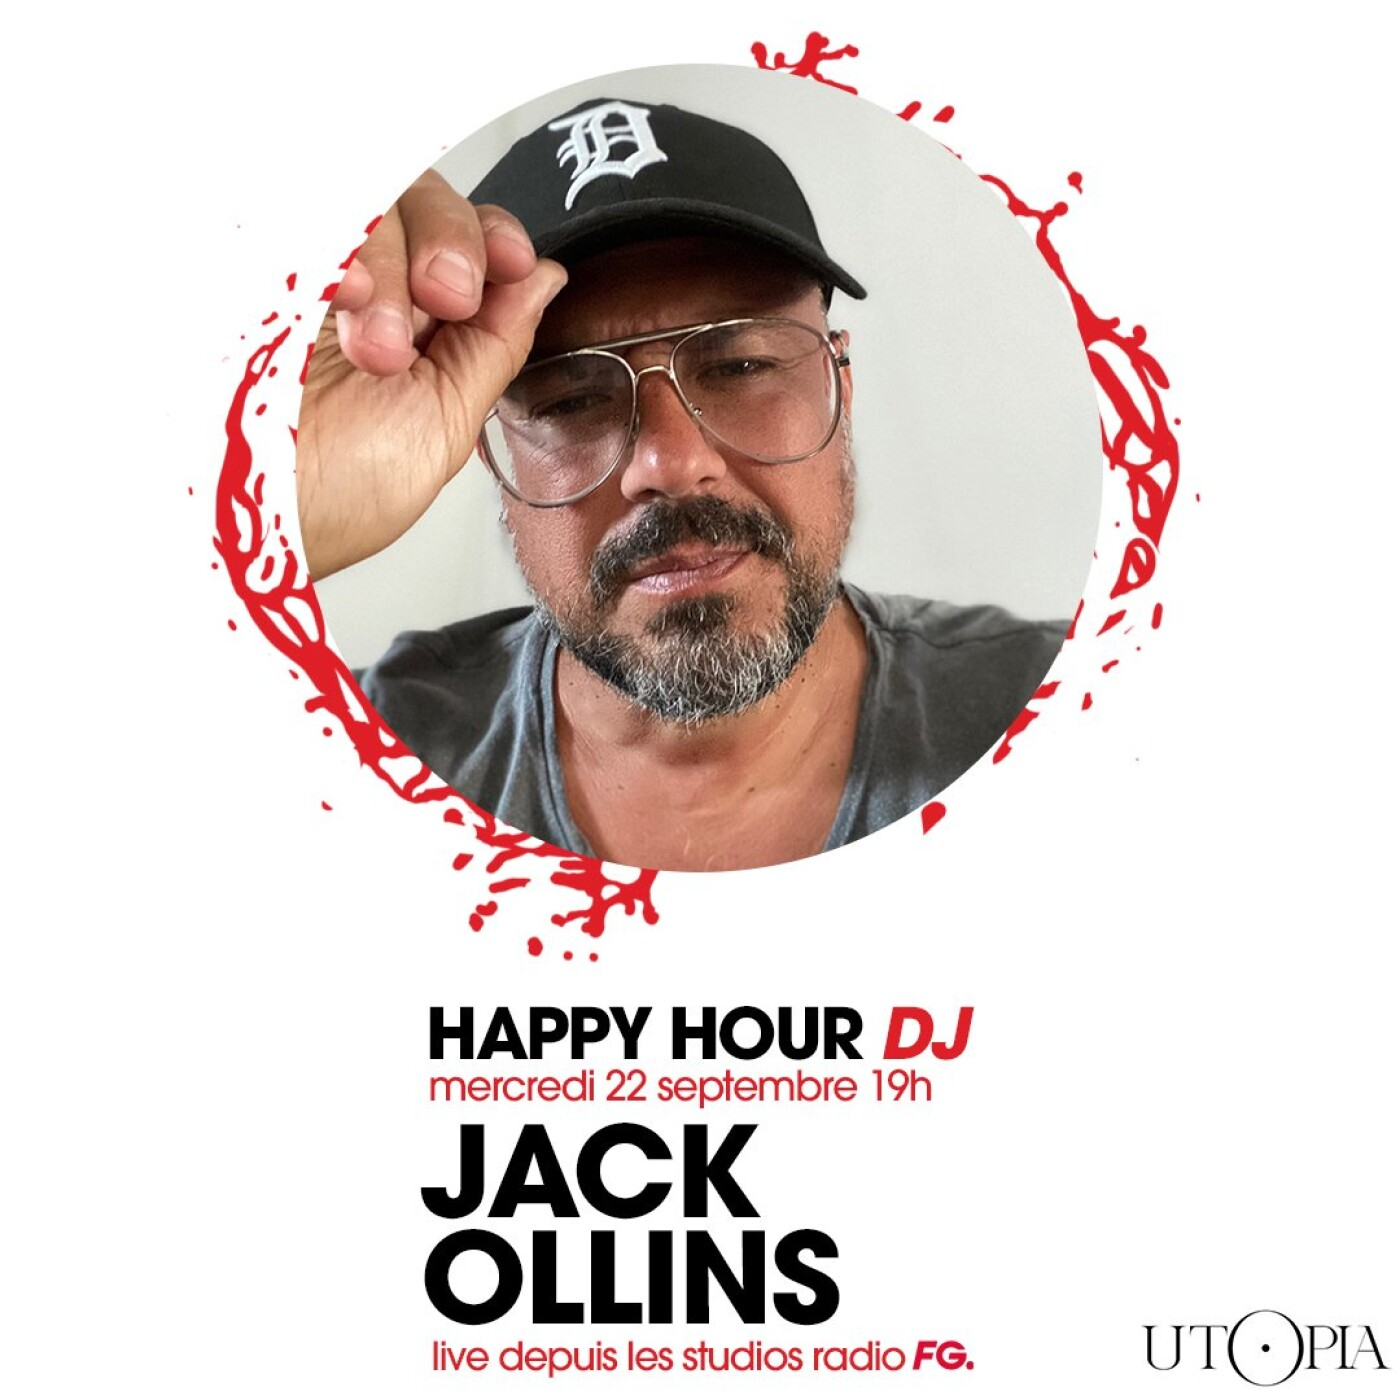 HAPPY HOUR DJ : JACK OLLINS